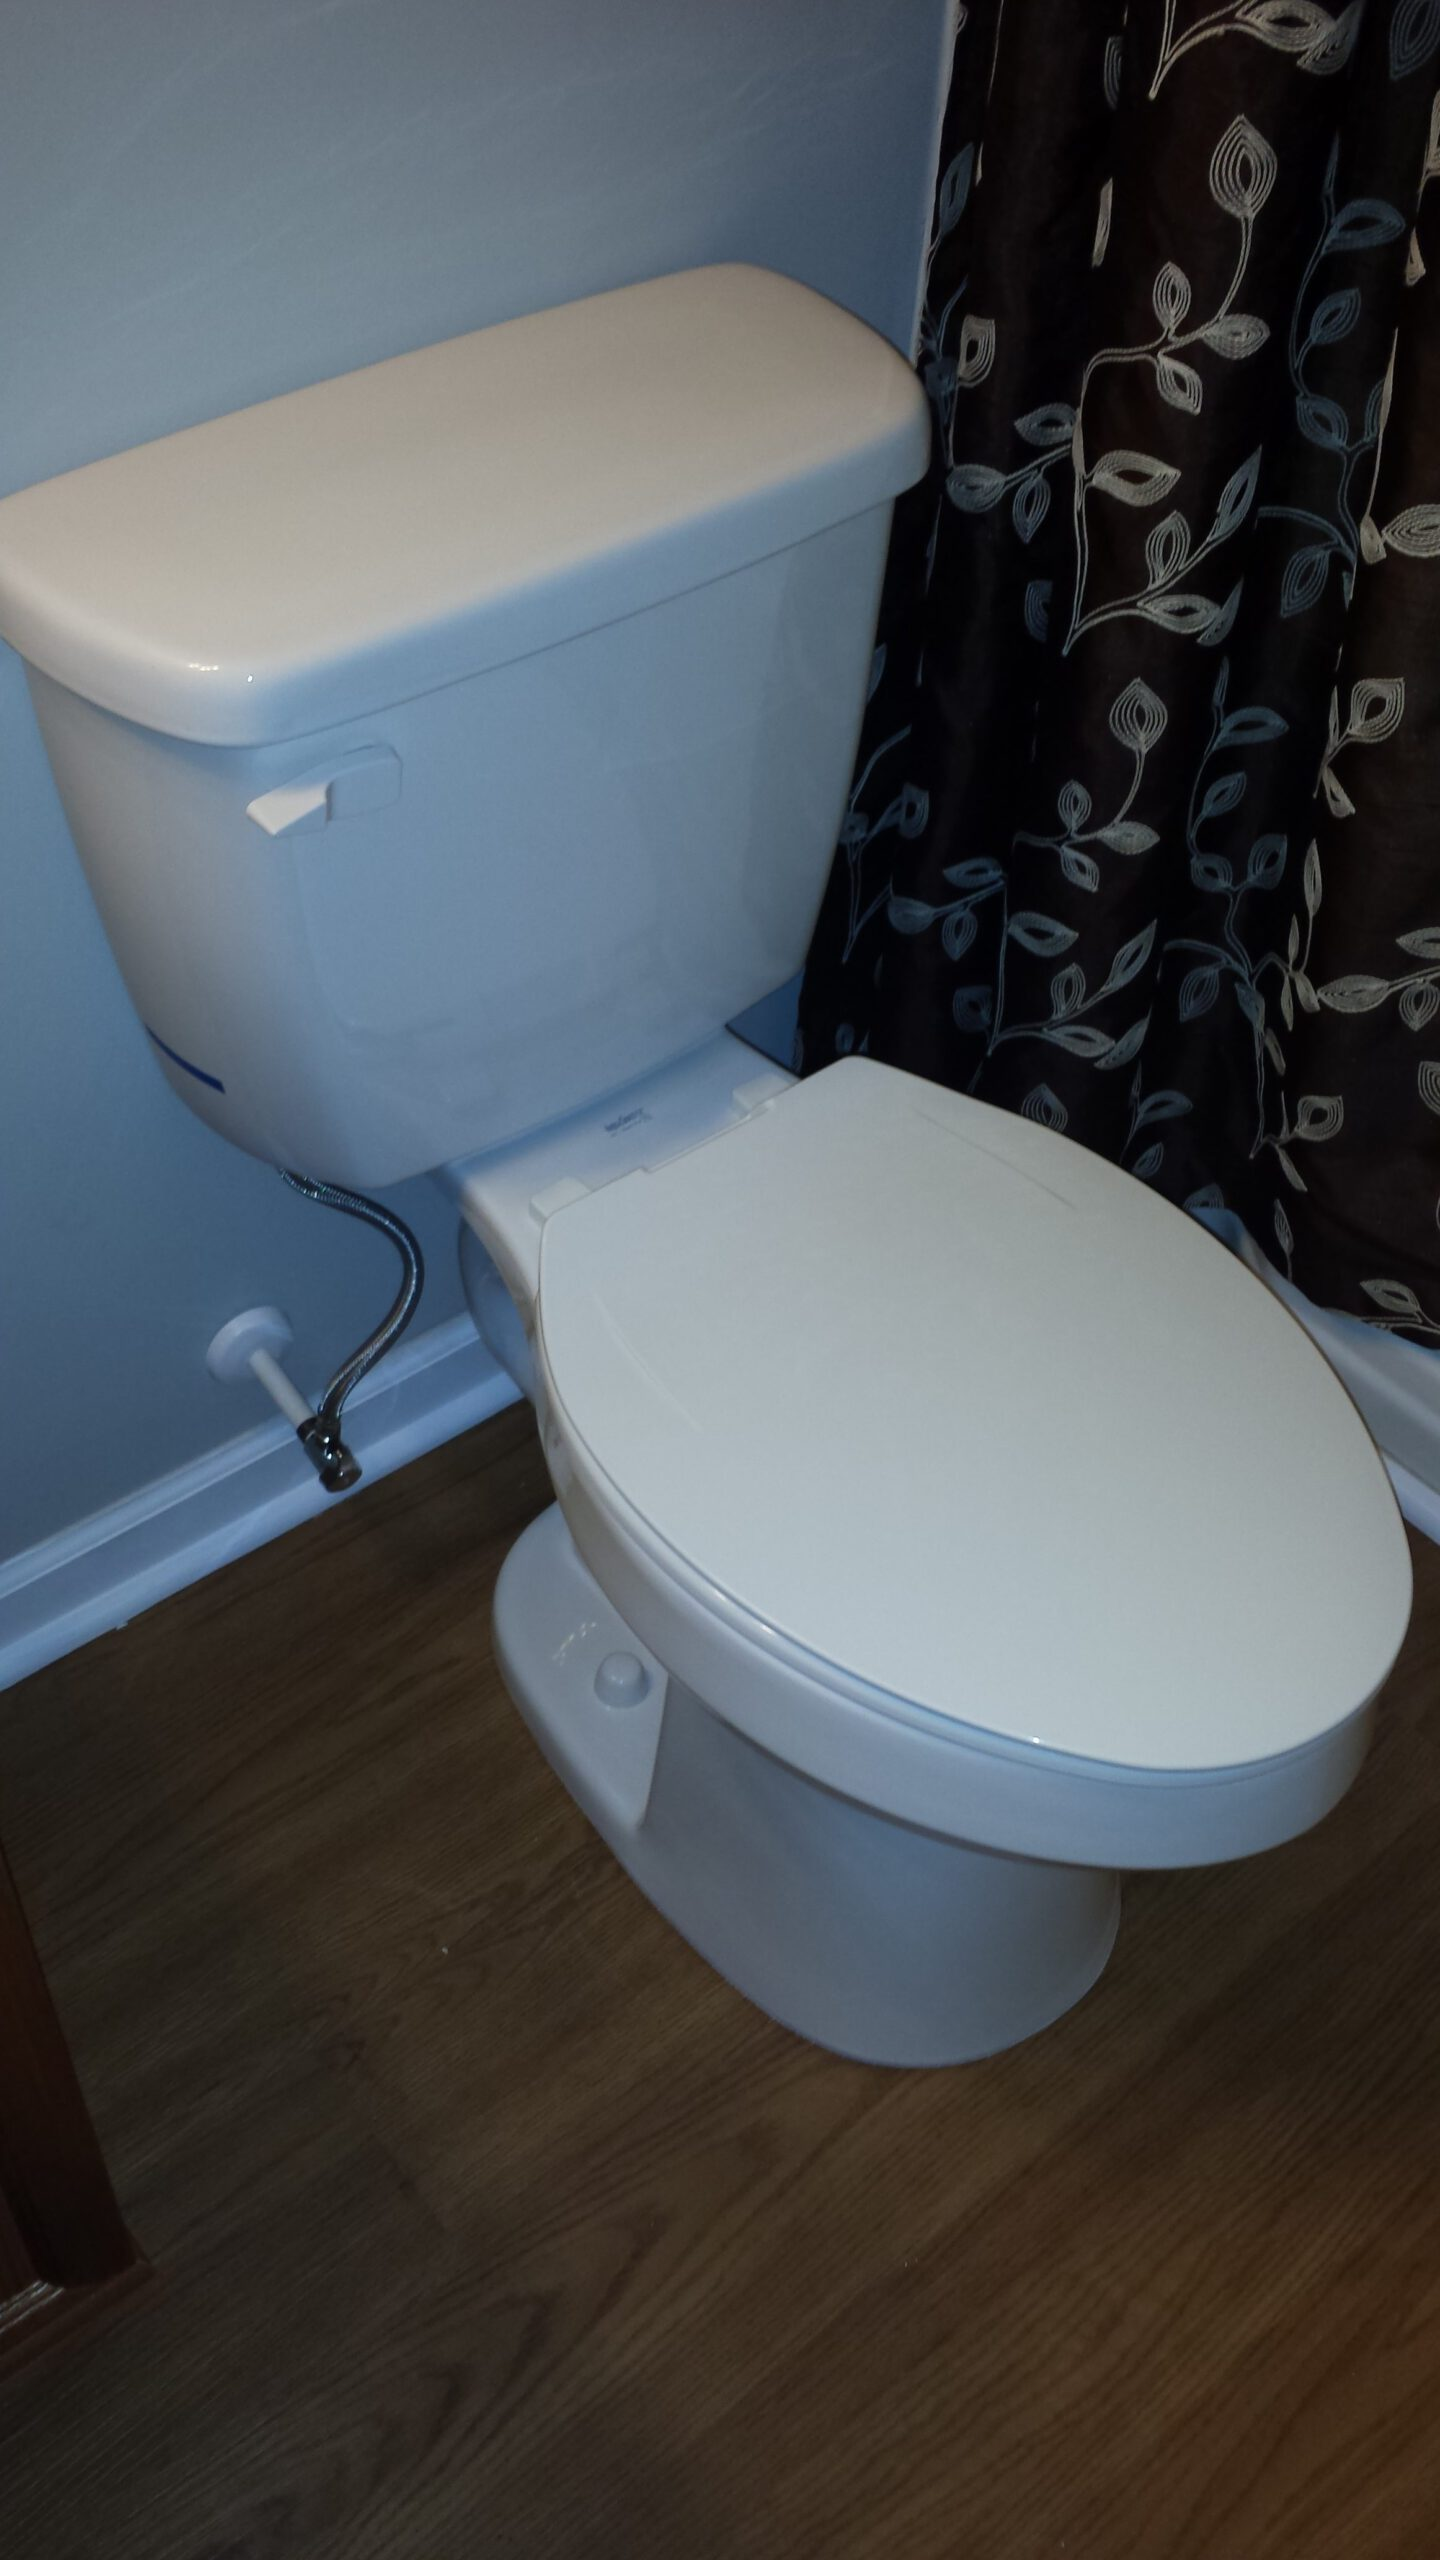 Bathroom Plumbing Service Raleigh Plumbers Golden Rule